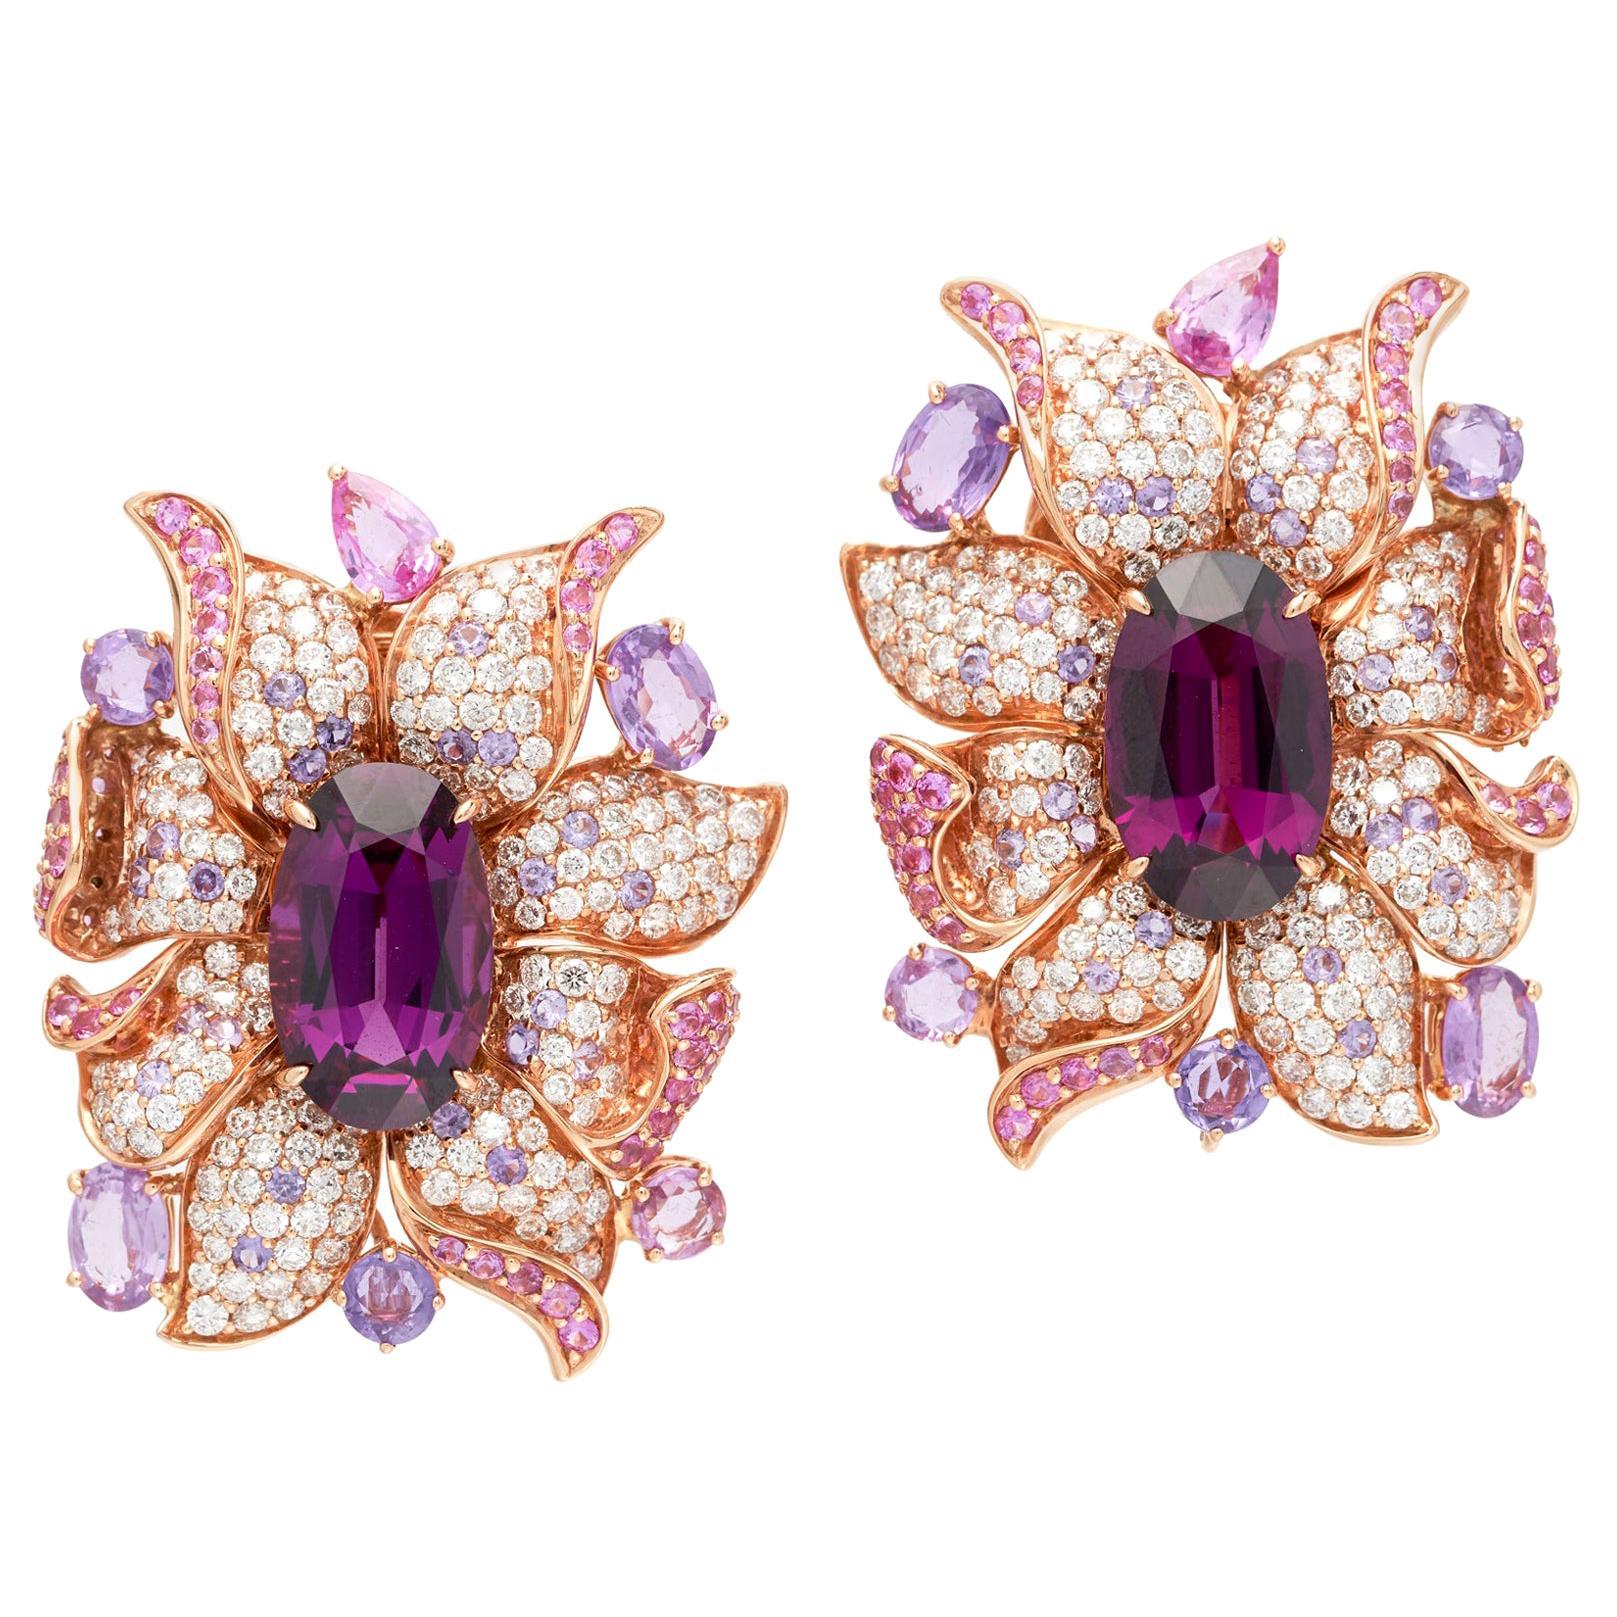 Margot McKinney 18 Karat Gold Umbalite Garnet, White Diamonds, Sapphire Earrings